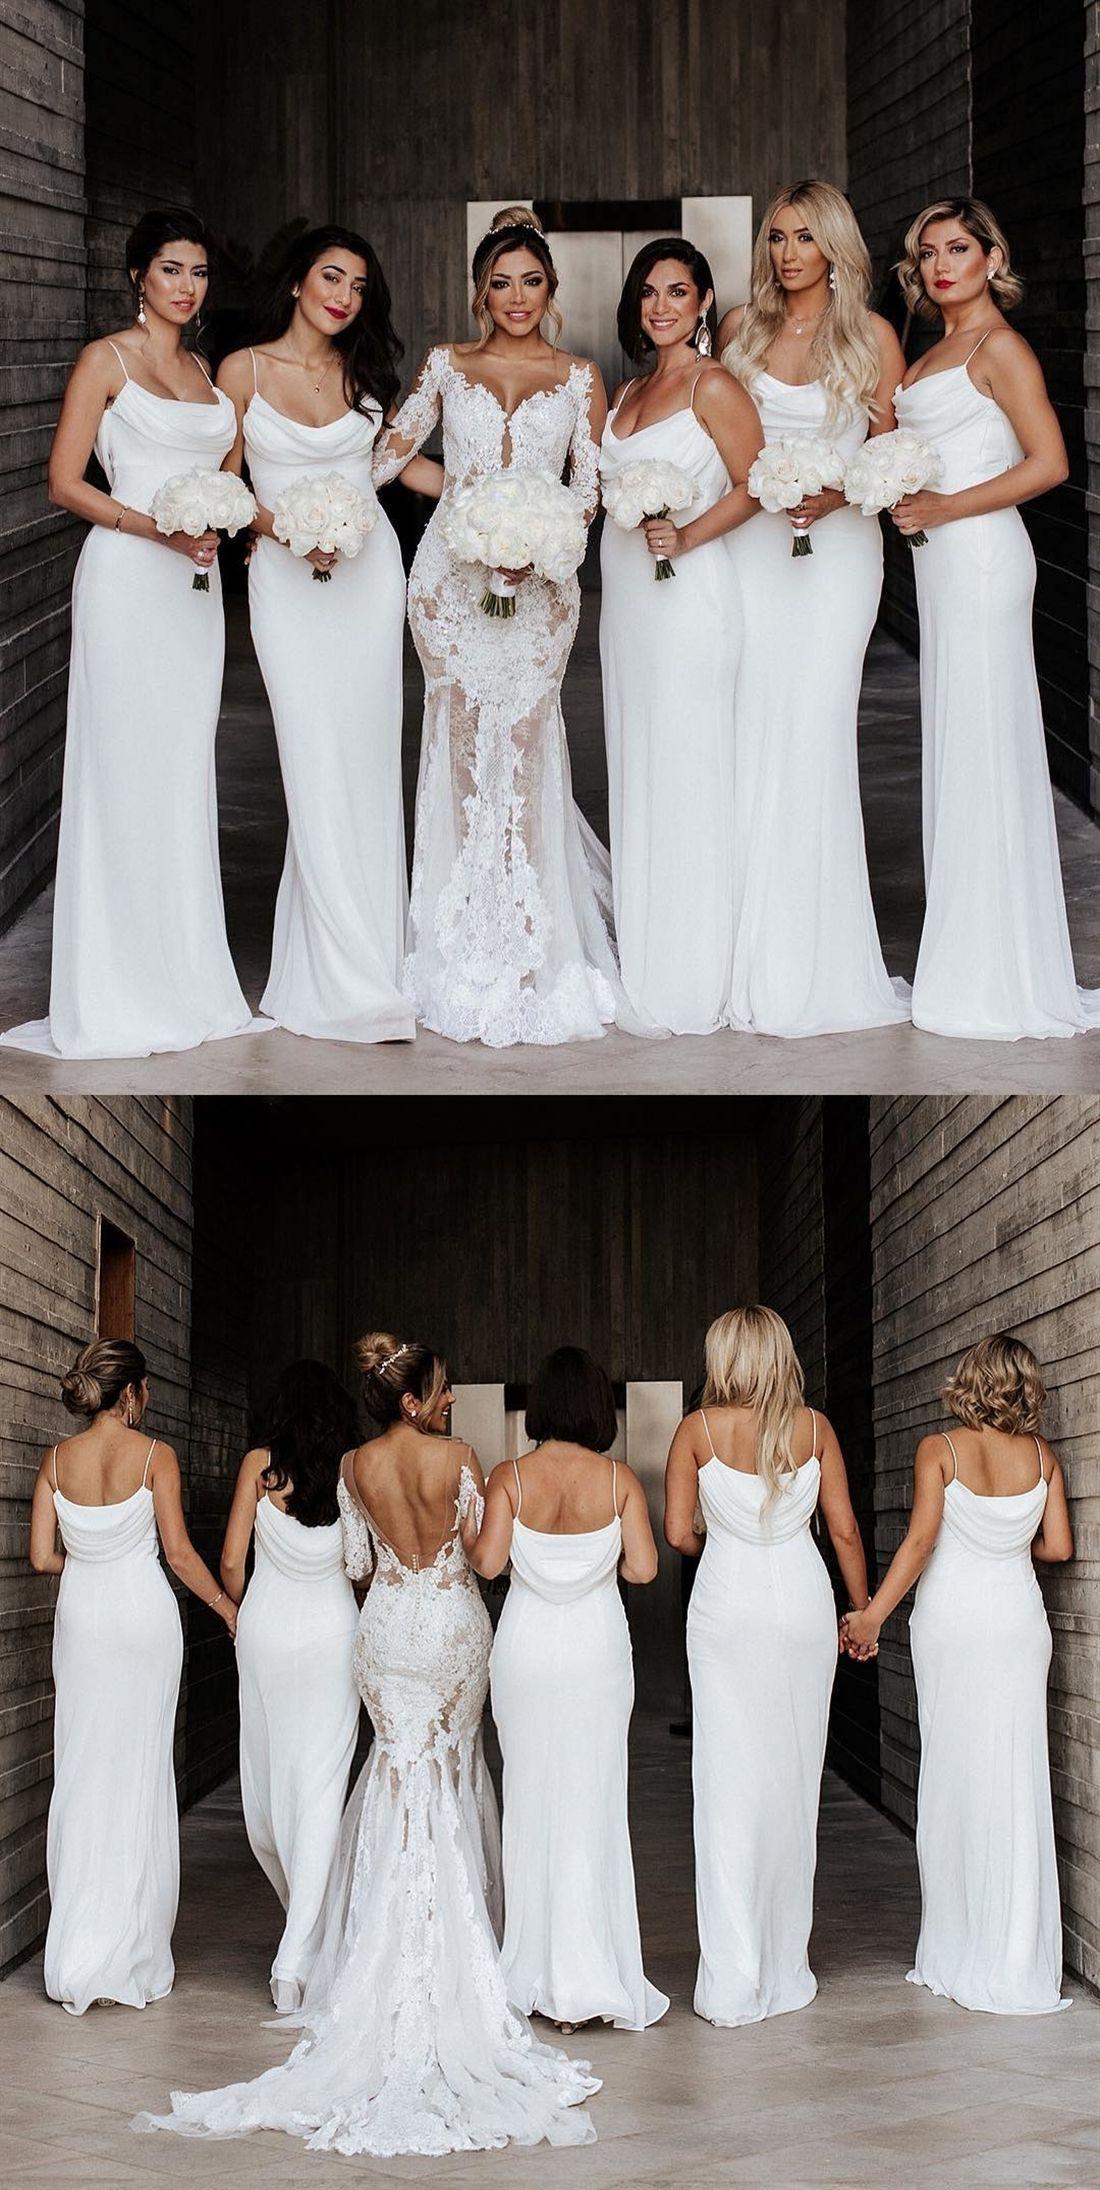 Cheap White Mermaid Bridesmaid Dresses Spaghetti Straps Long Wedding Party Dre Ivory Bridesmaid Dresses White Bridesmaid Dresses White Bridesmaid Dresses Long